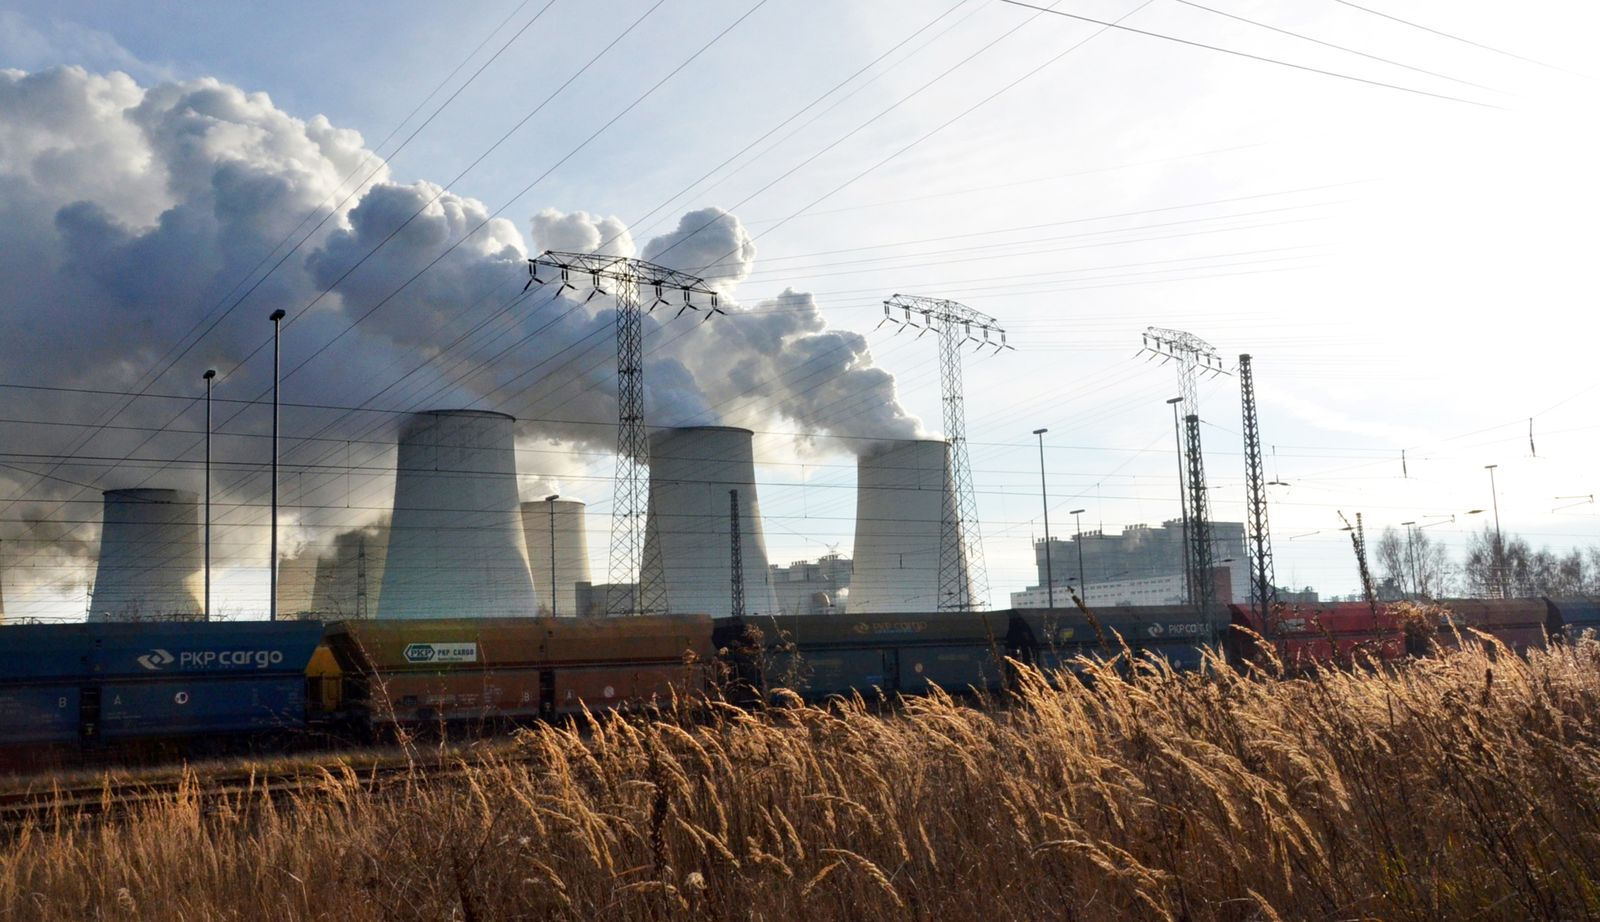 Braunkohlekraftwerk Jänschwalde / Vattenfall